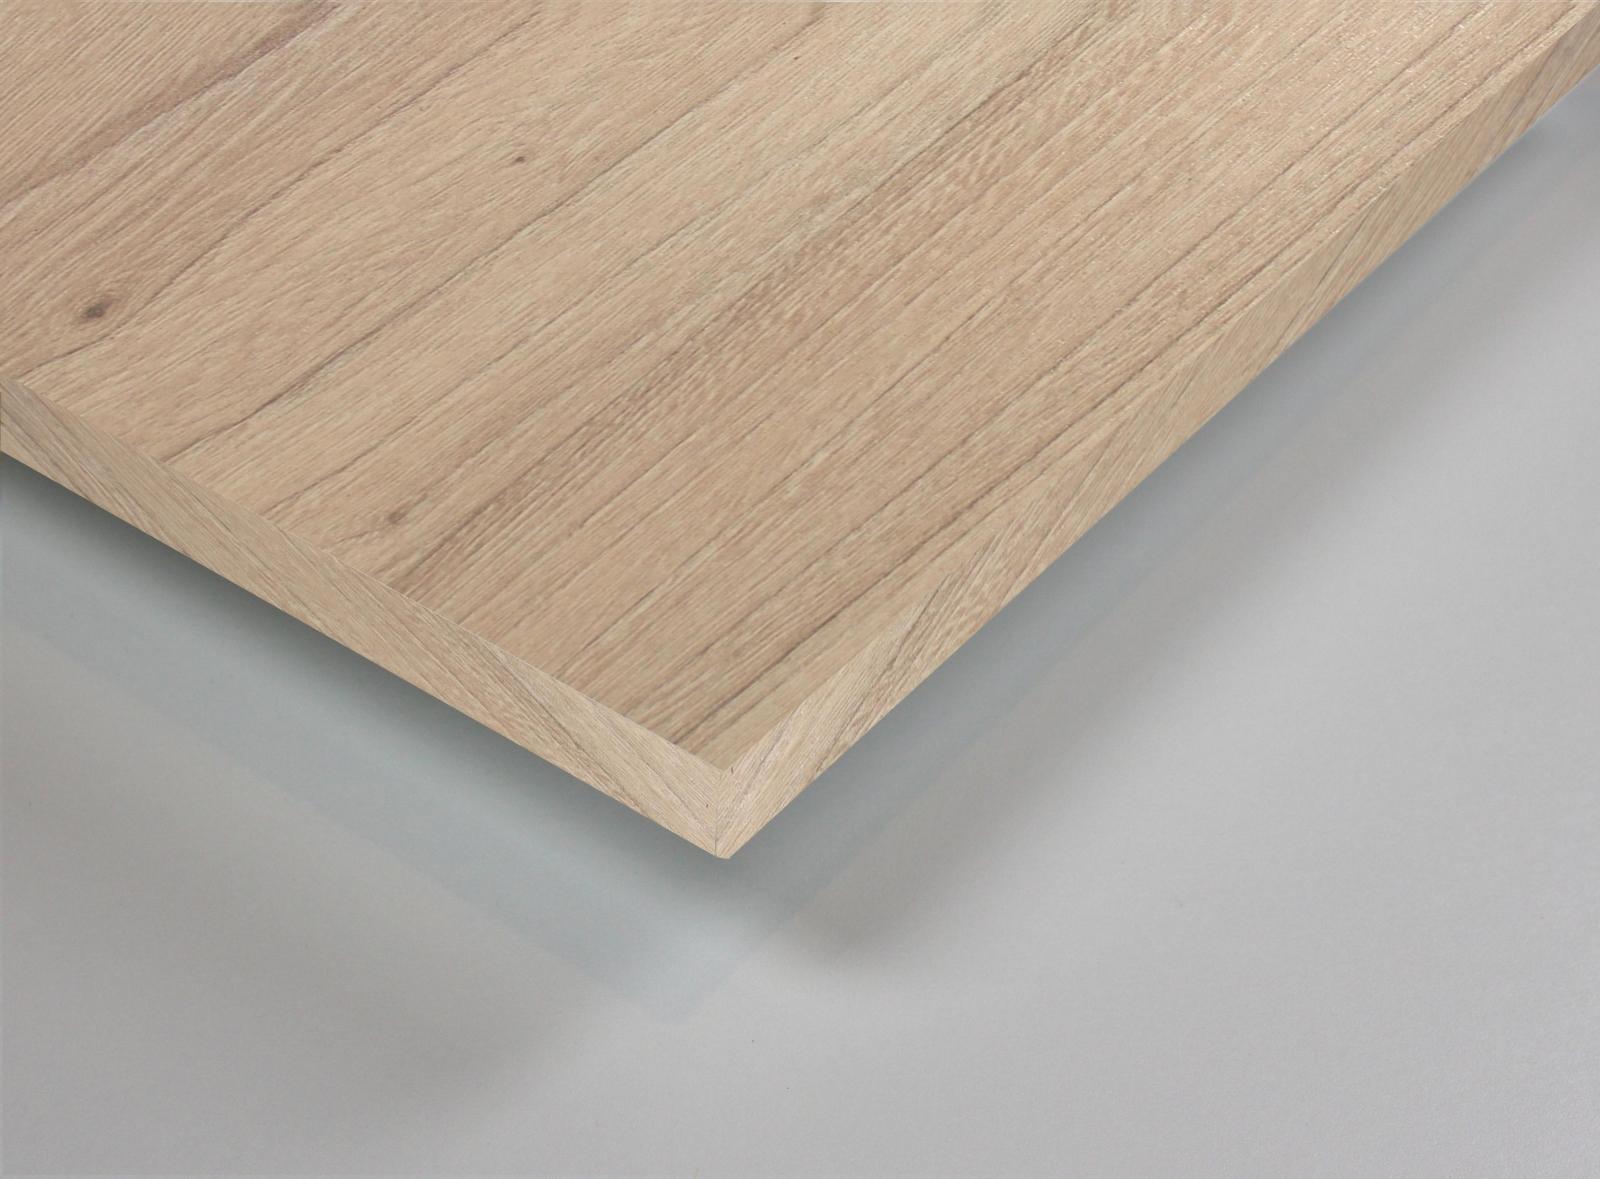 dekorholz swiss elm kalt holzzuschnitt. Black Bedroom Furniture Sets. Home Design Ideas